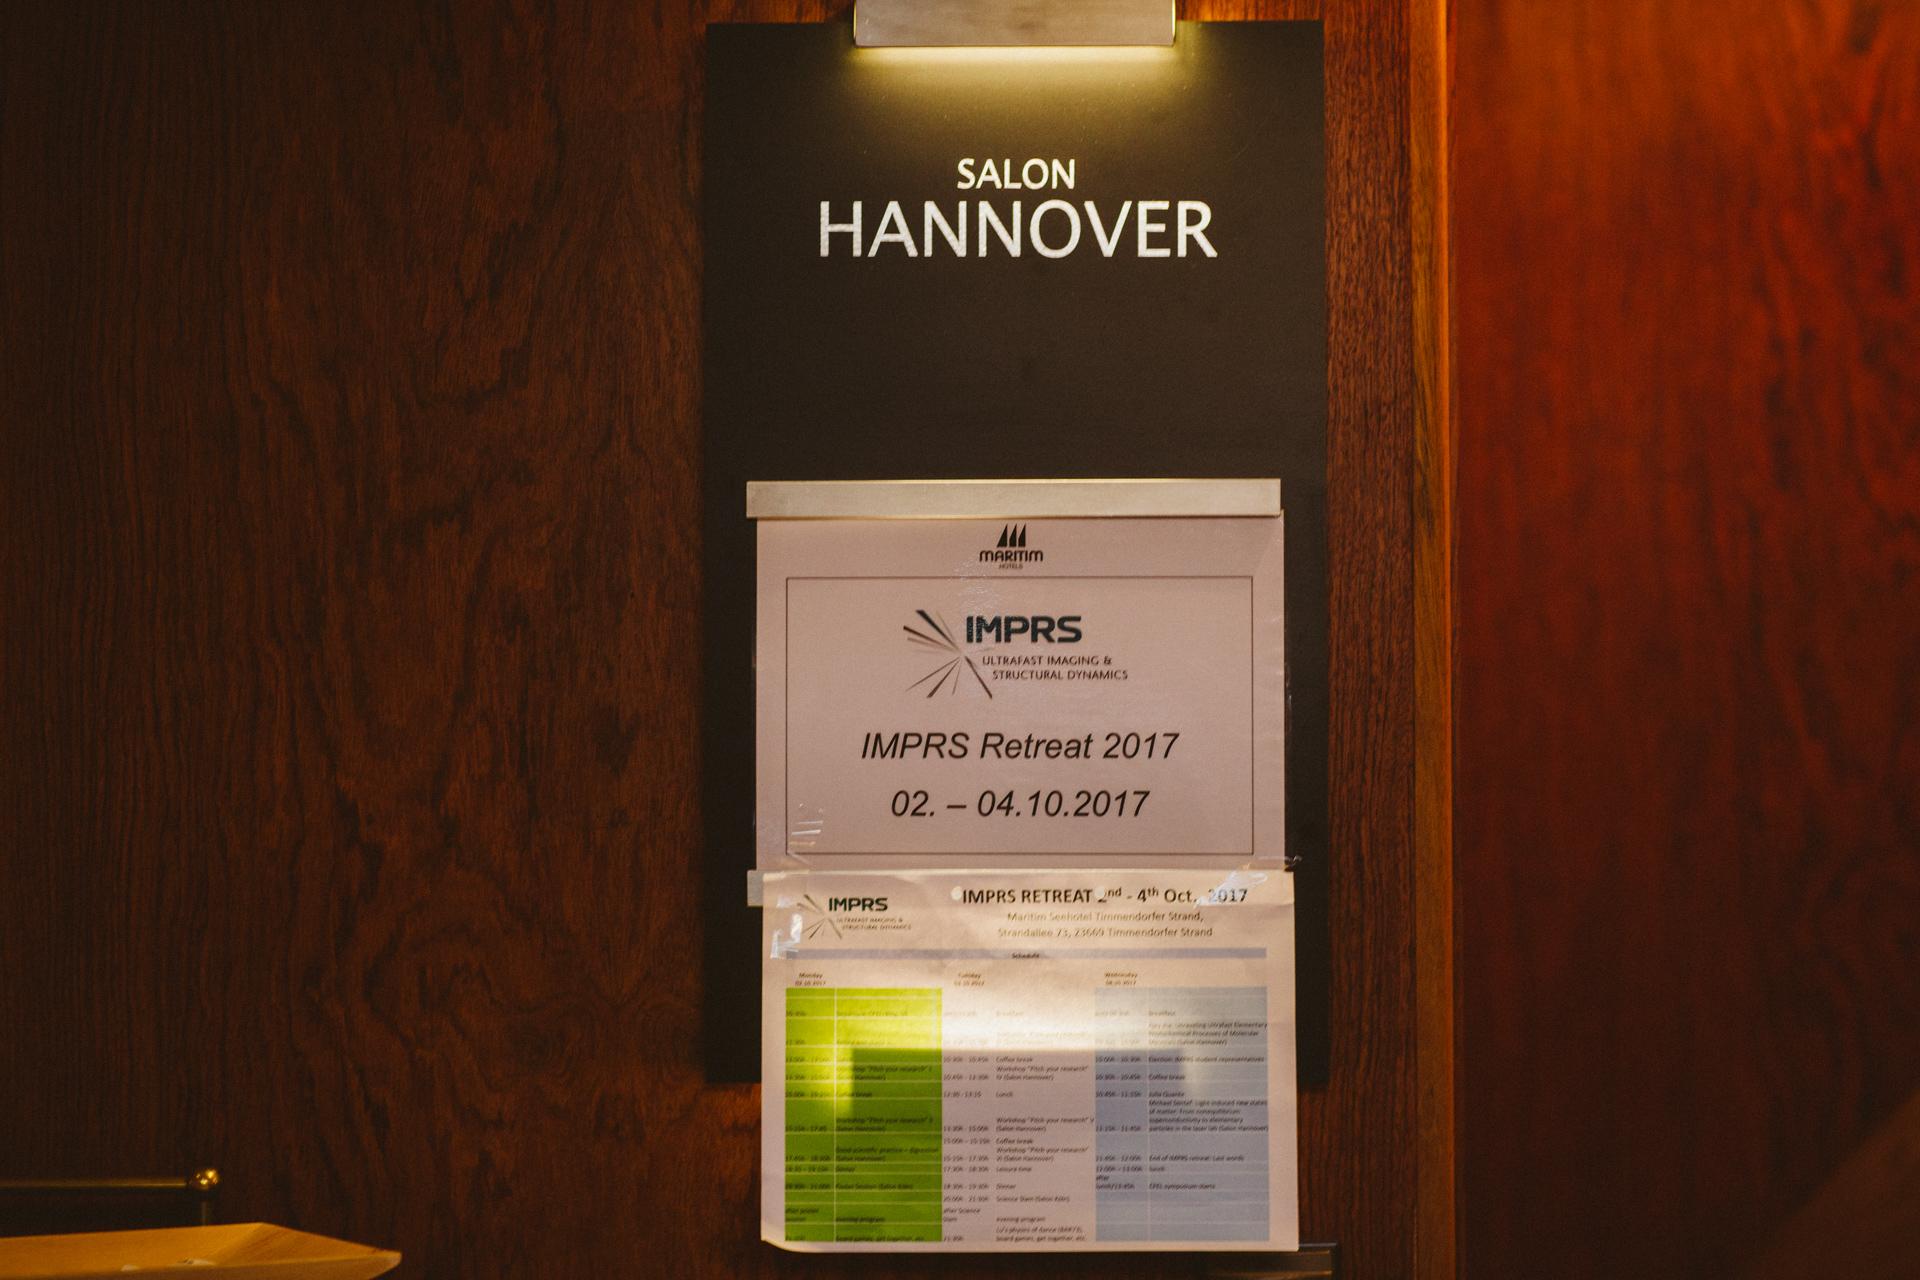 IMPRS Seminar 2017